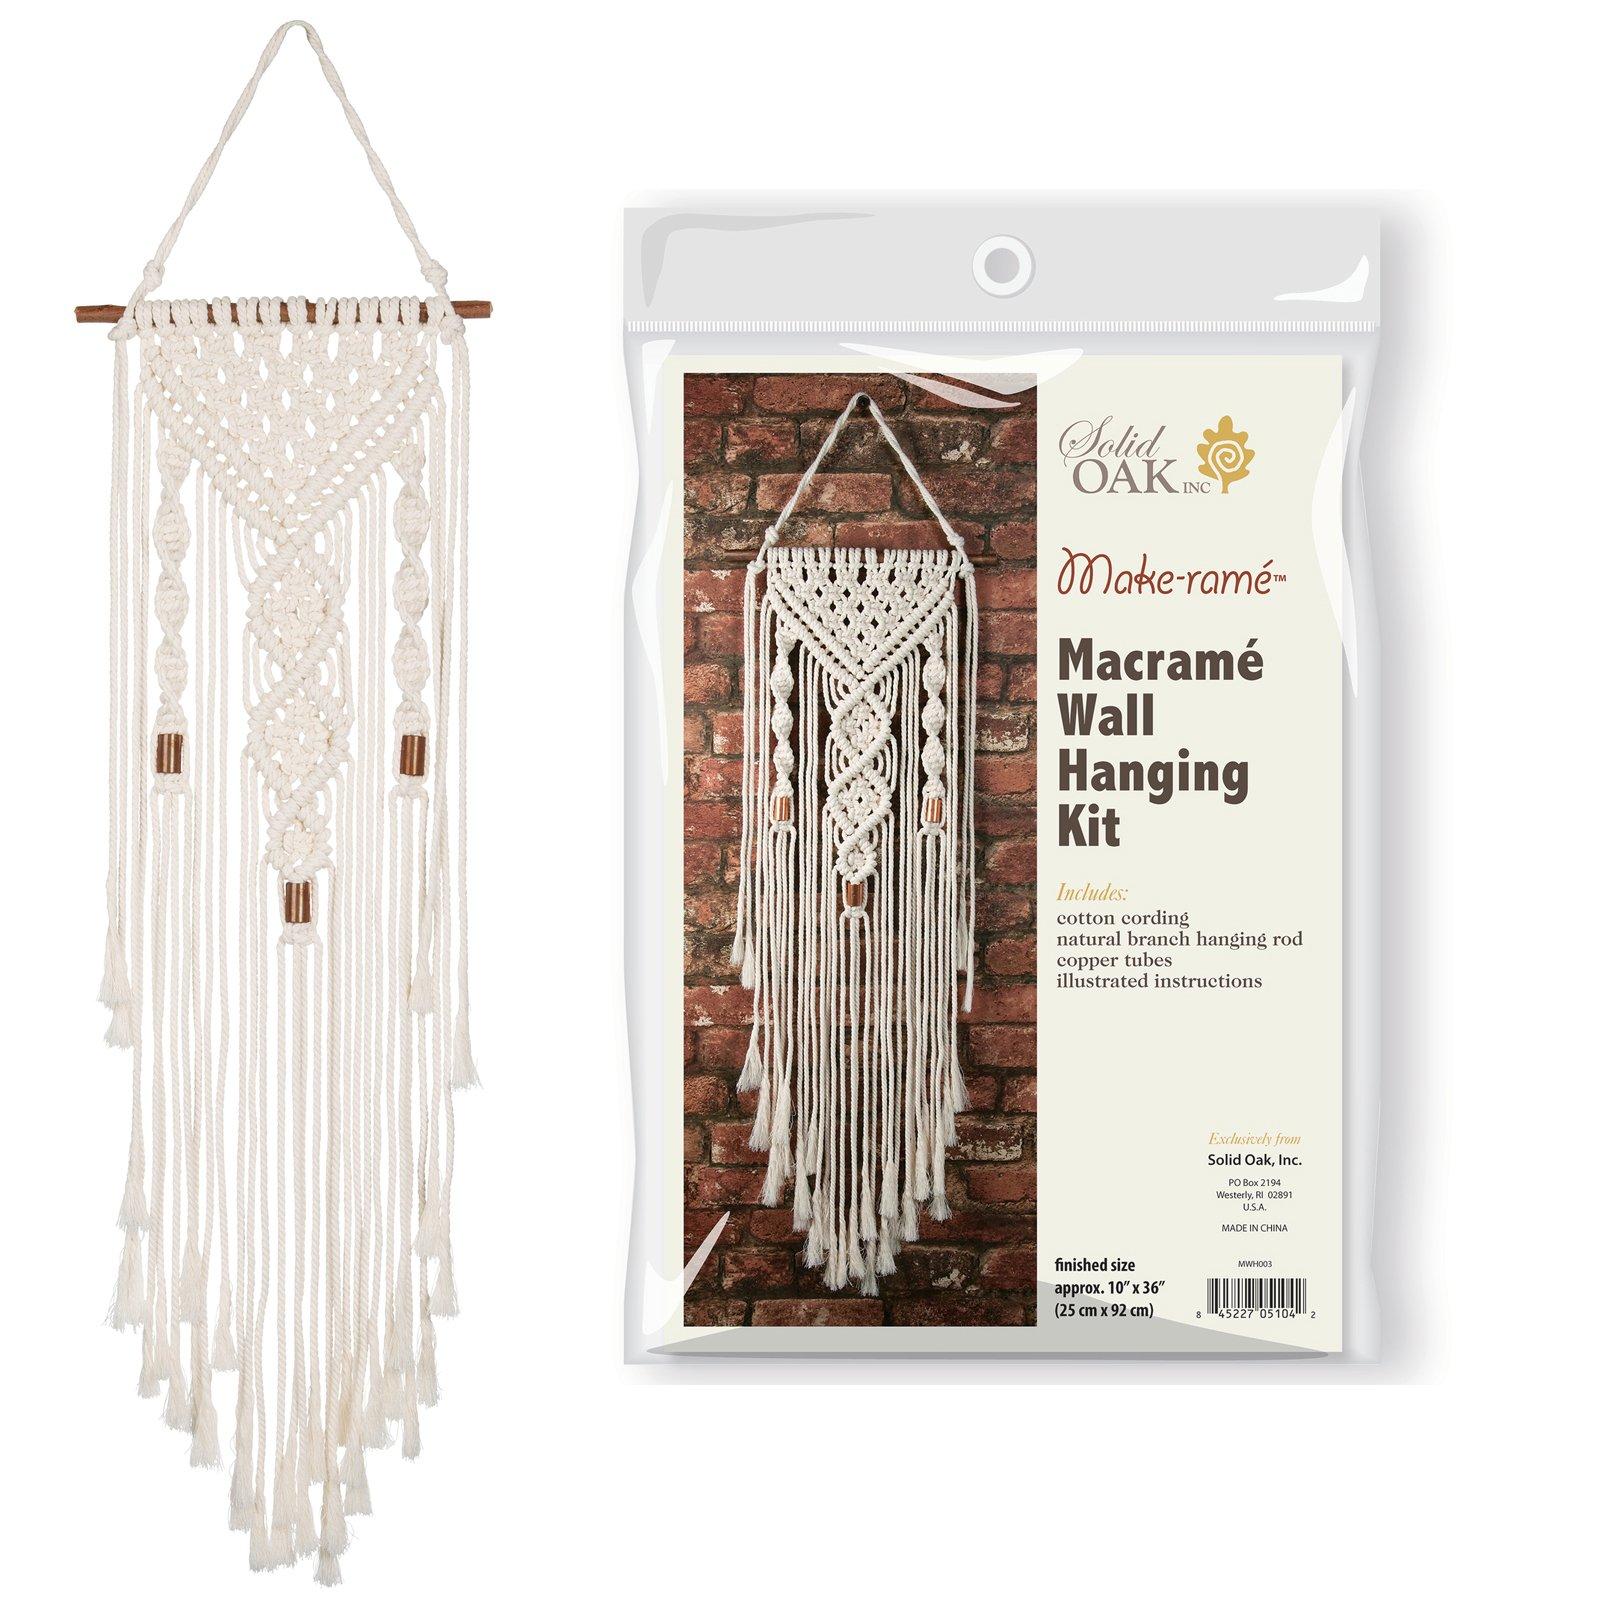 Double Twist Macrame Wall Hanging Kit